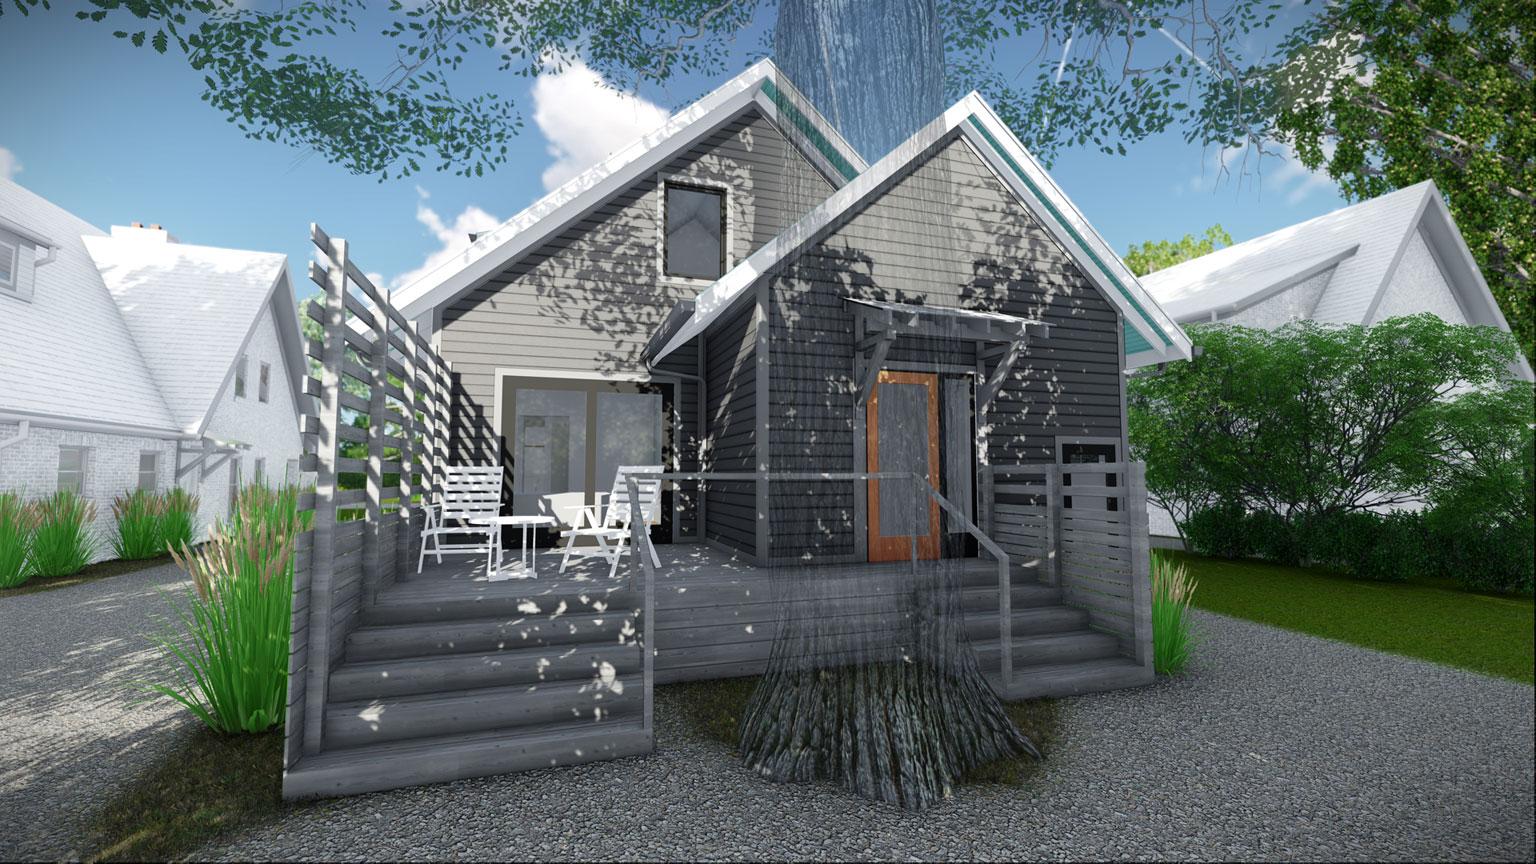 Broad Ripple Modern Craftsman Renovation - Christopher Short, Architect, Indianapolis, HAUS Architecture